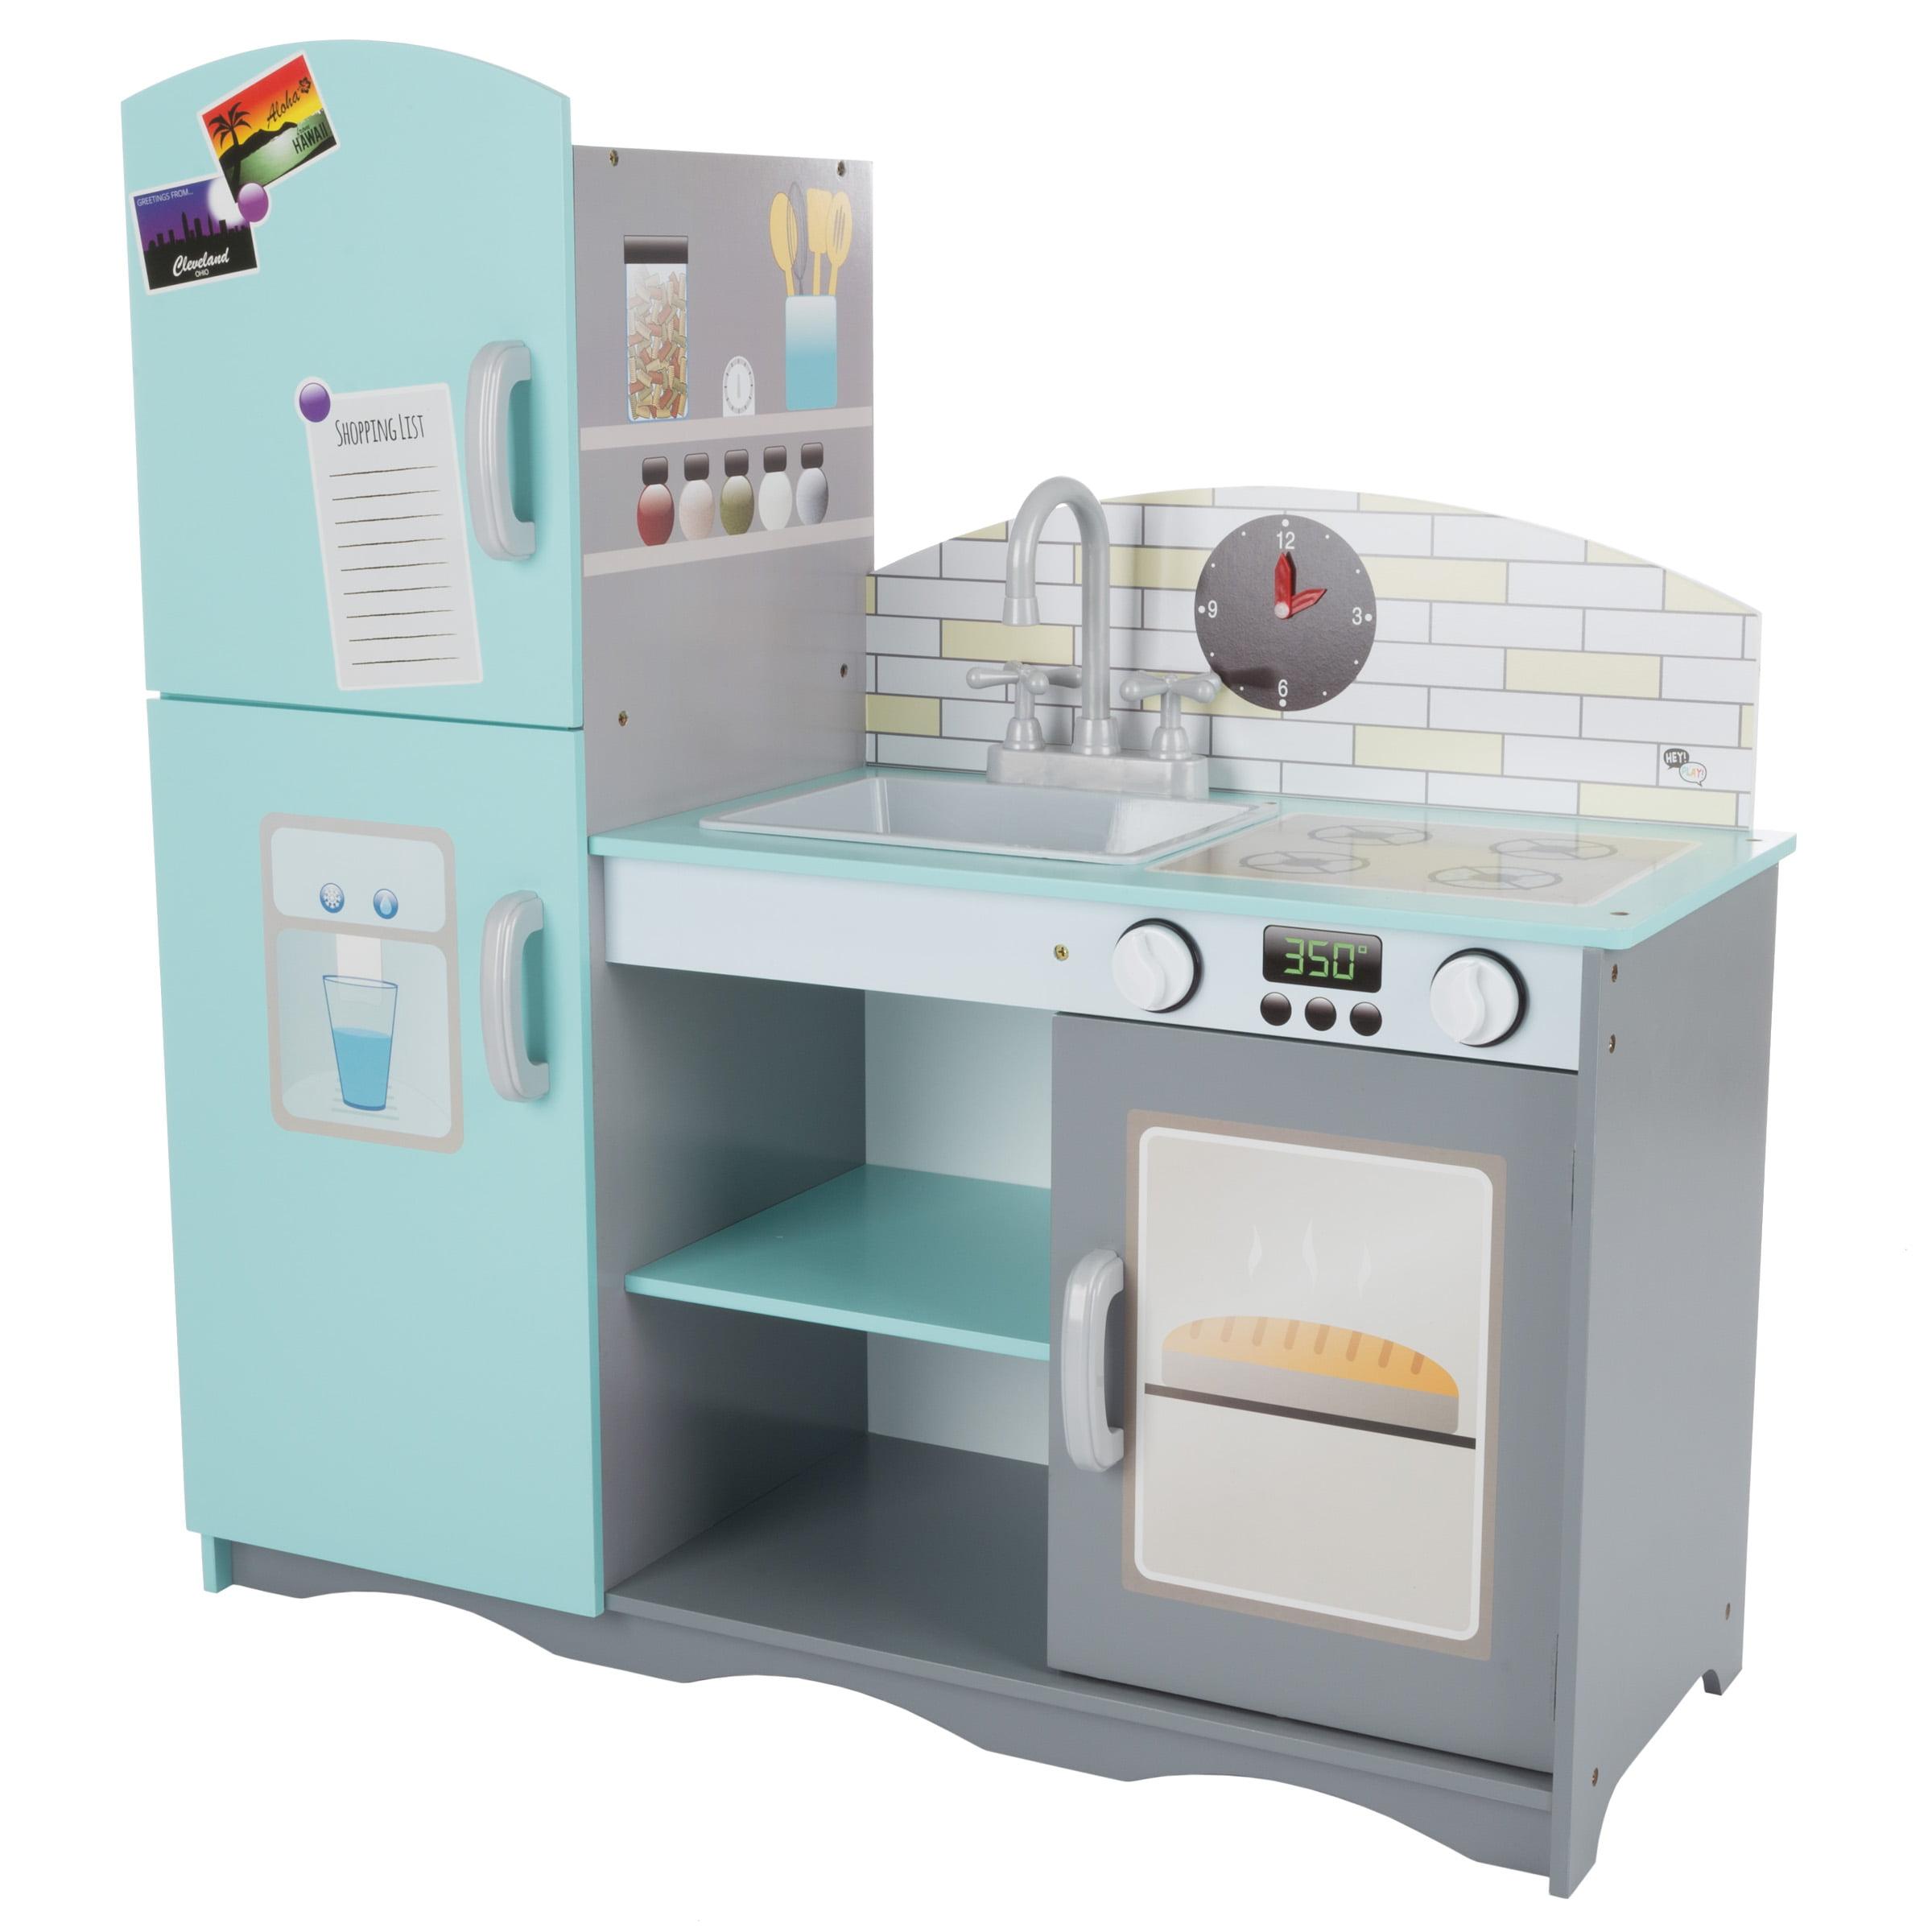 Kids Toy Kitchen Set Fun Pretend Play Home Kitchen Playset With